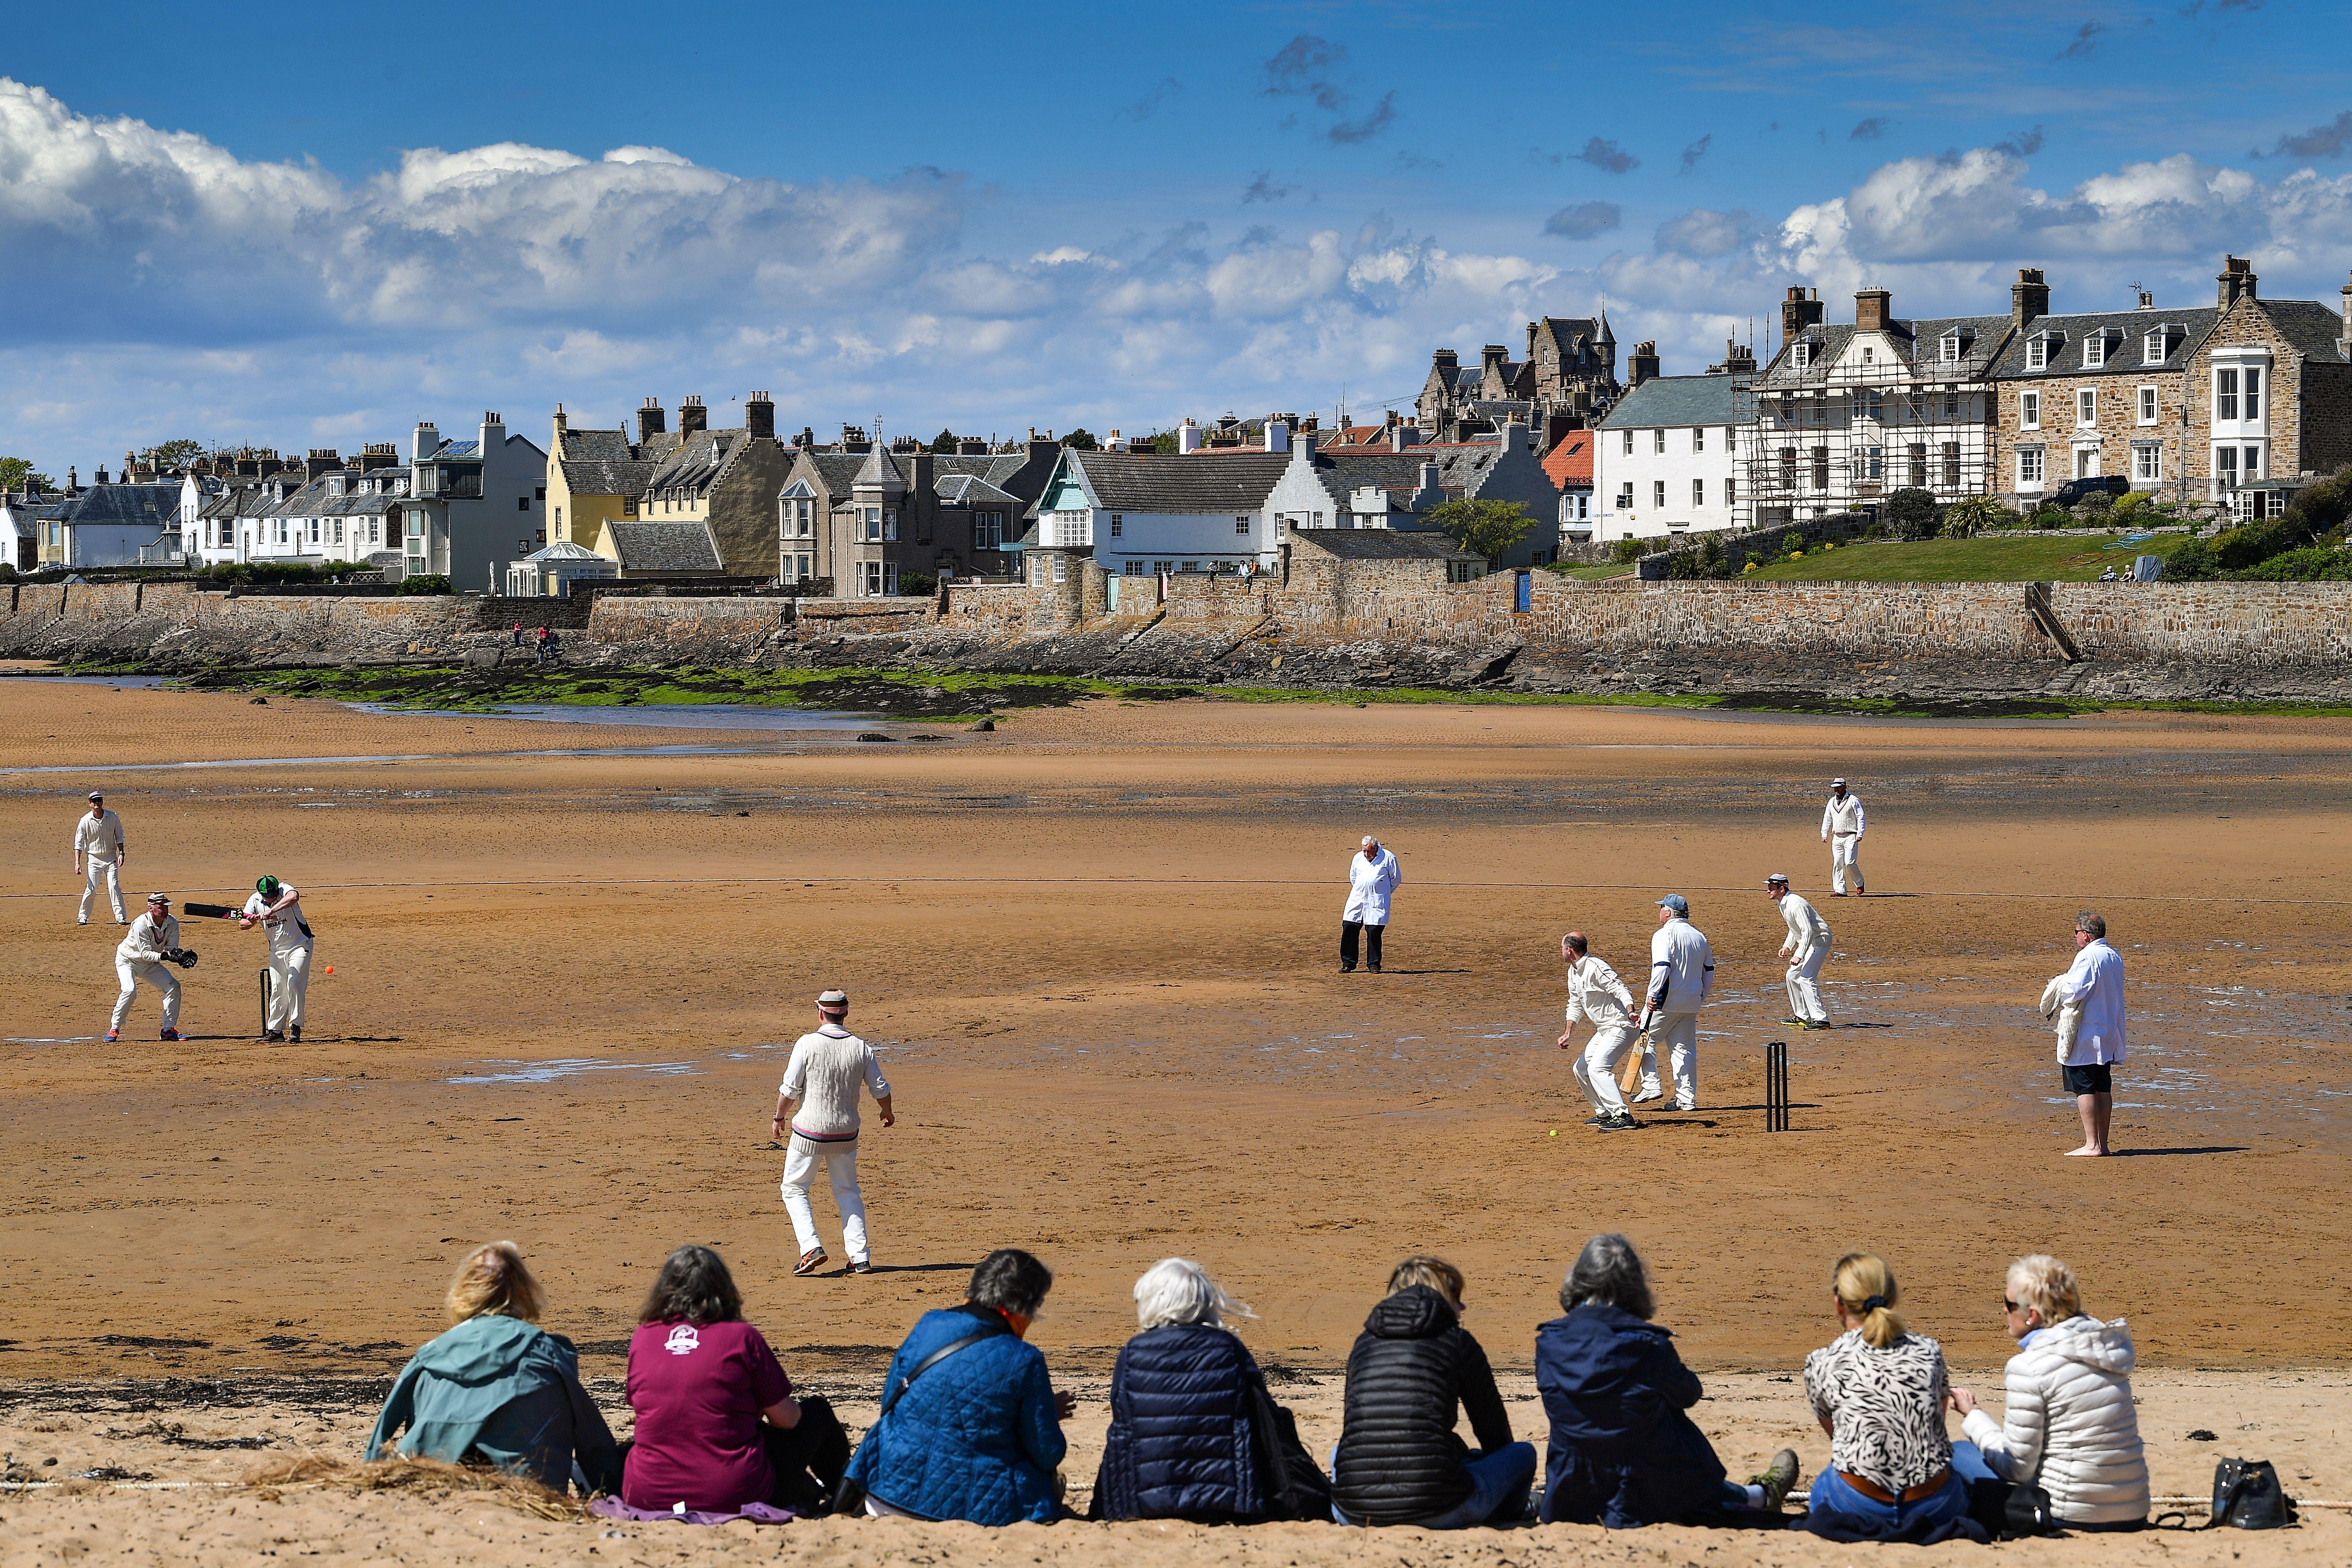 The Ship Inn cricket pitch